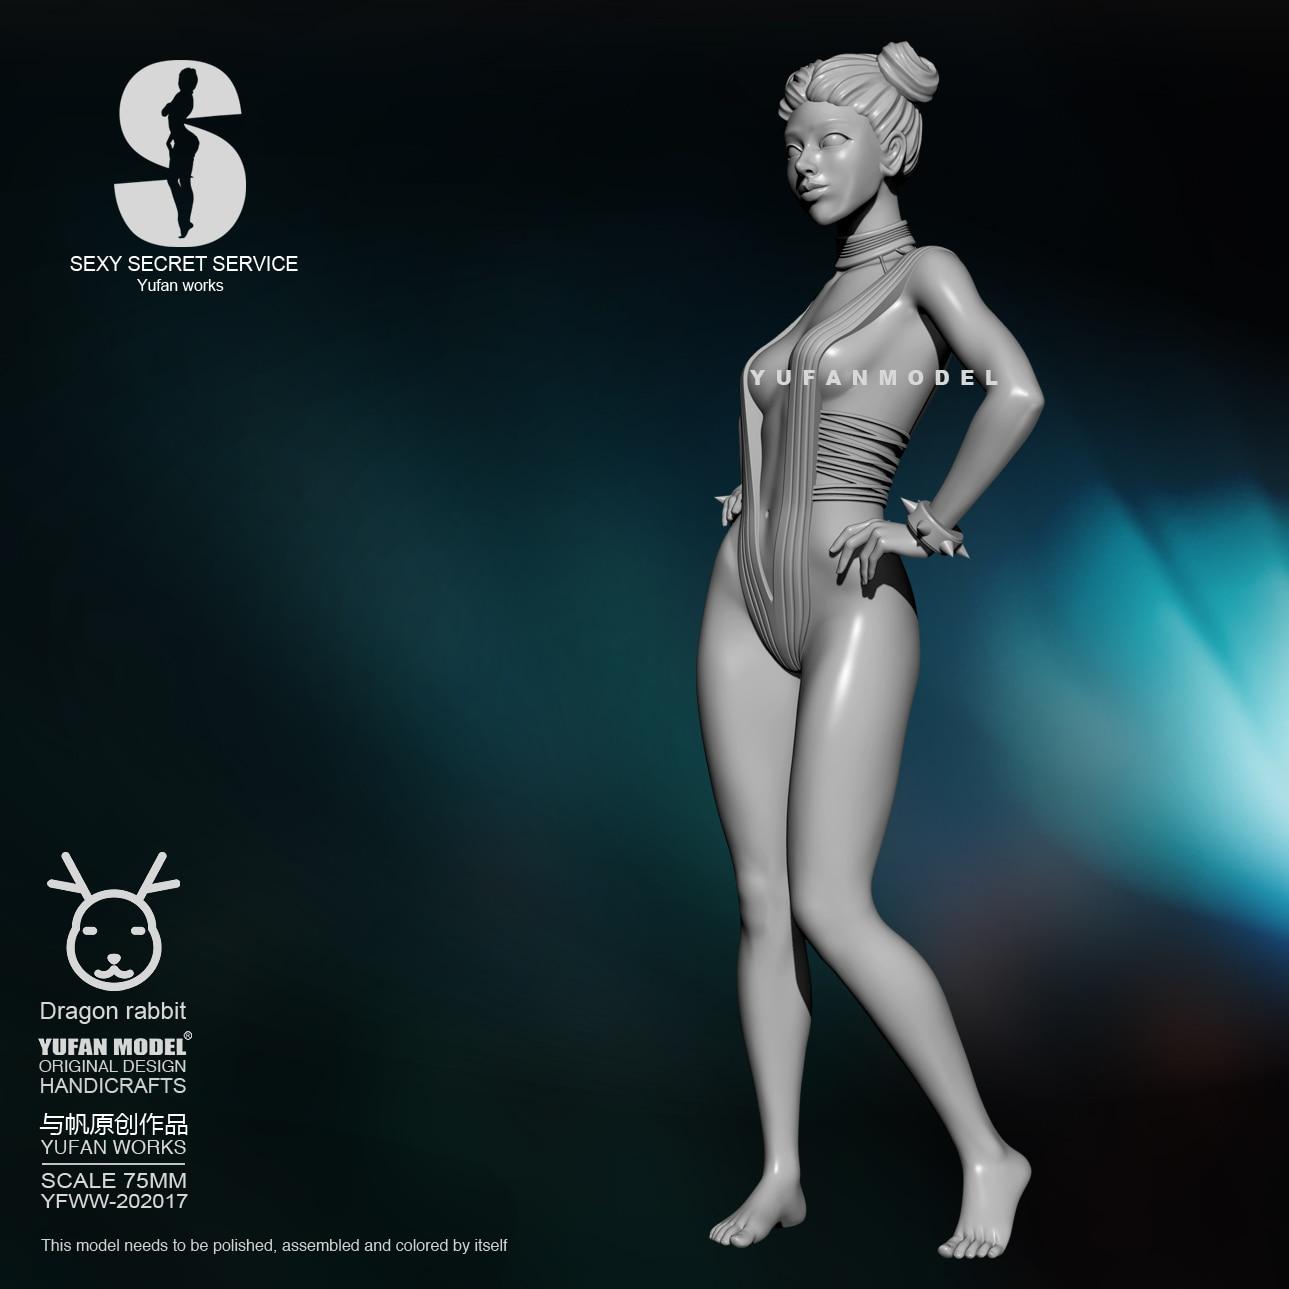 1/24 Resin Figure Kits Beauty Agent Self-assembled YFWW-2061